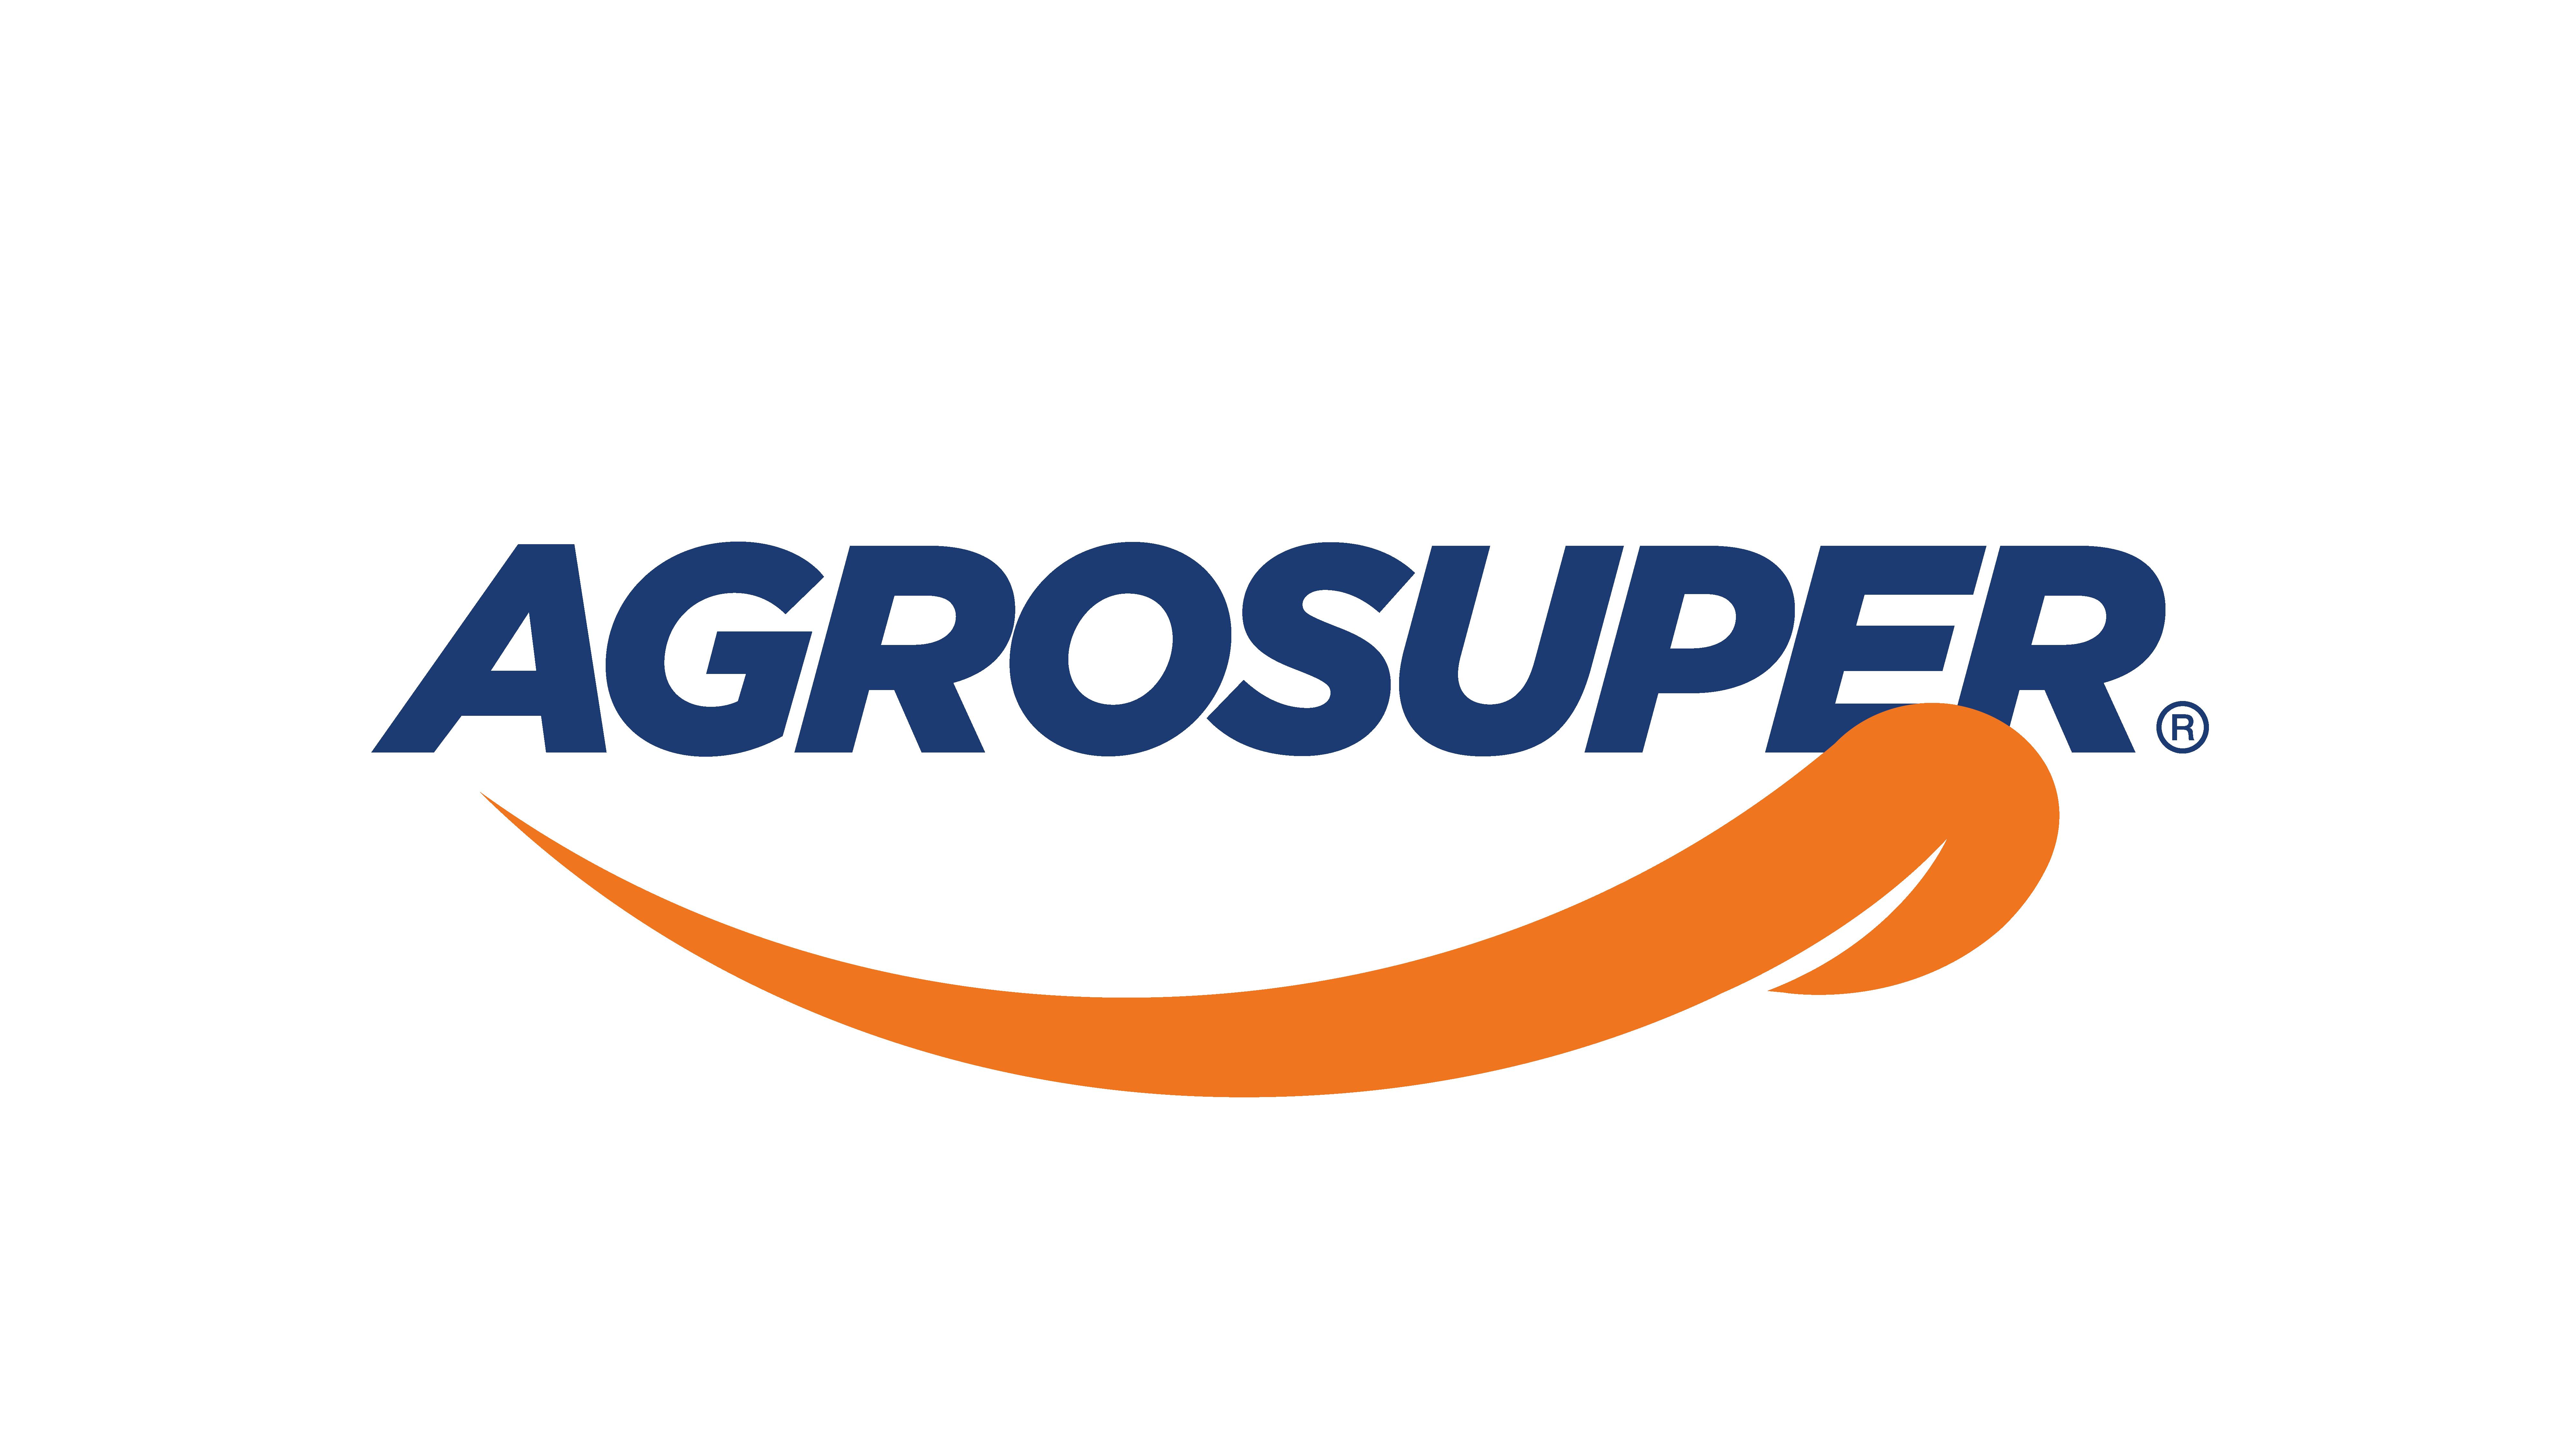 Agrosuperpng new logo